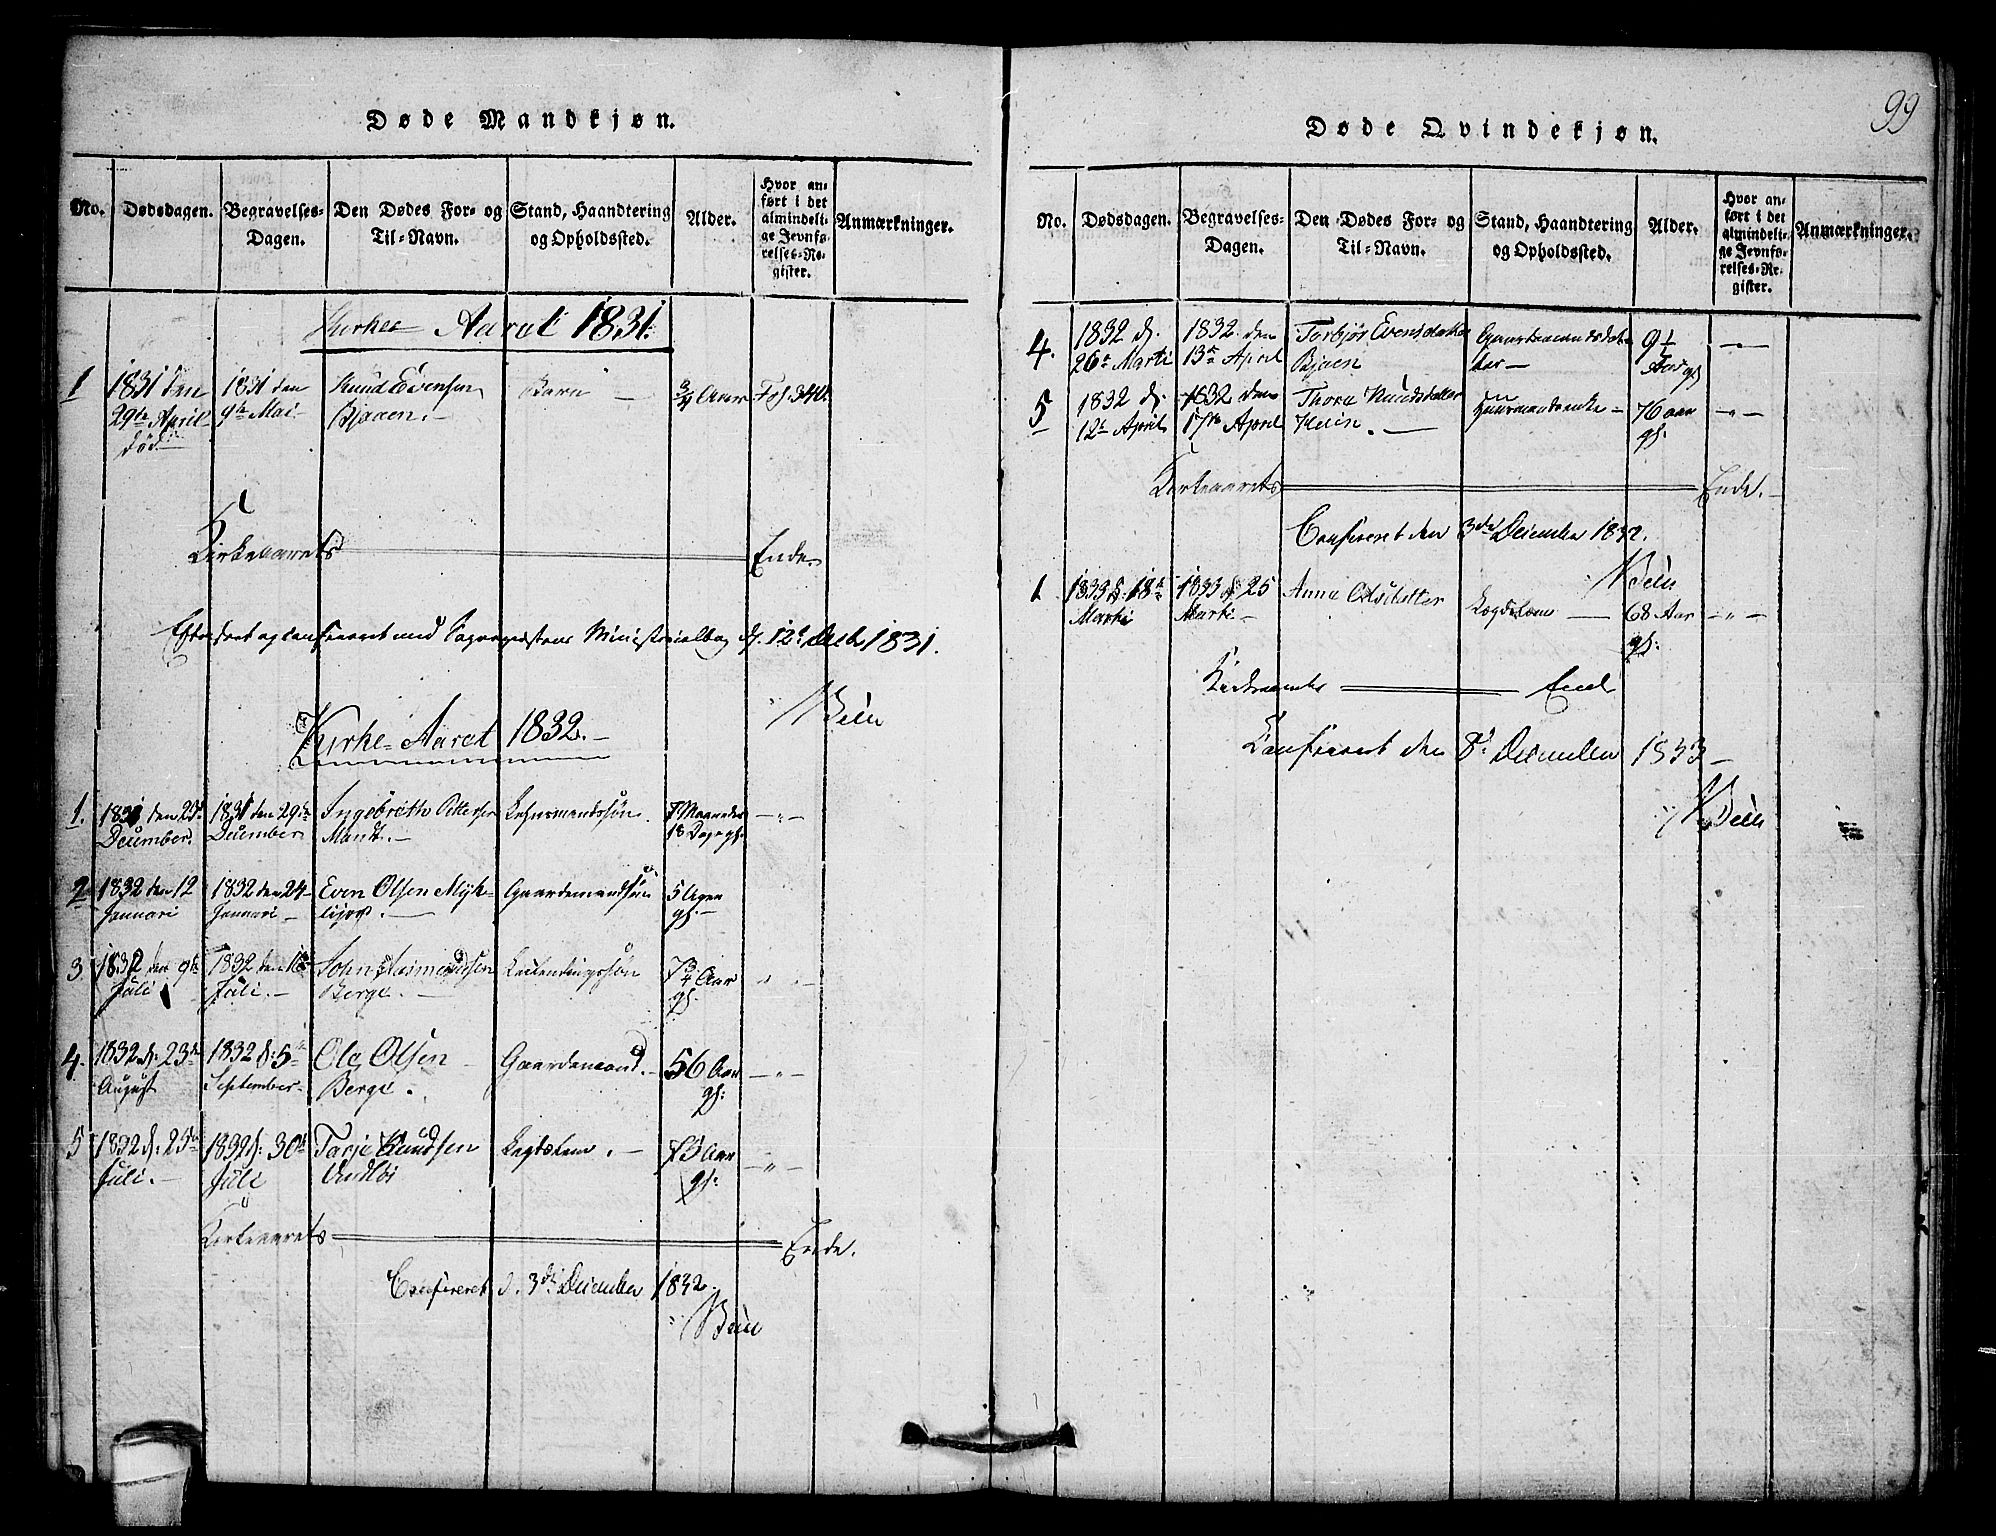 SAKO, Lårdal kirkebøker, G/Gb/L0001: Klokkerbok nr. II 1, 1815-1865, s. 99